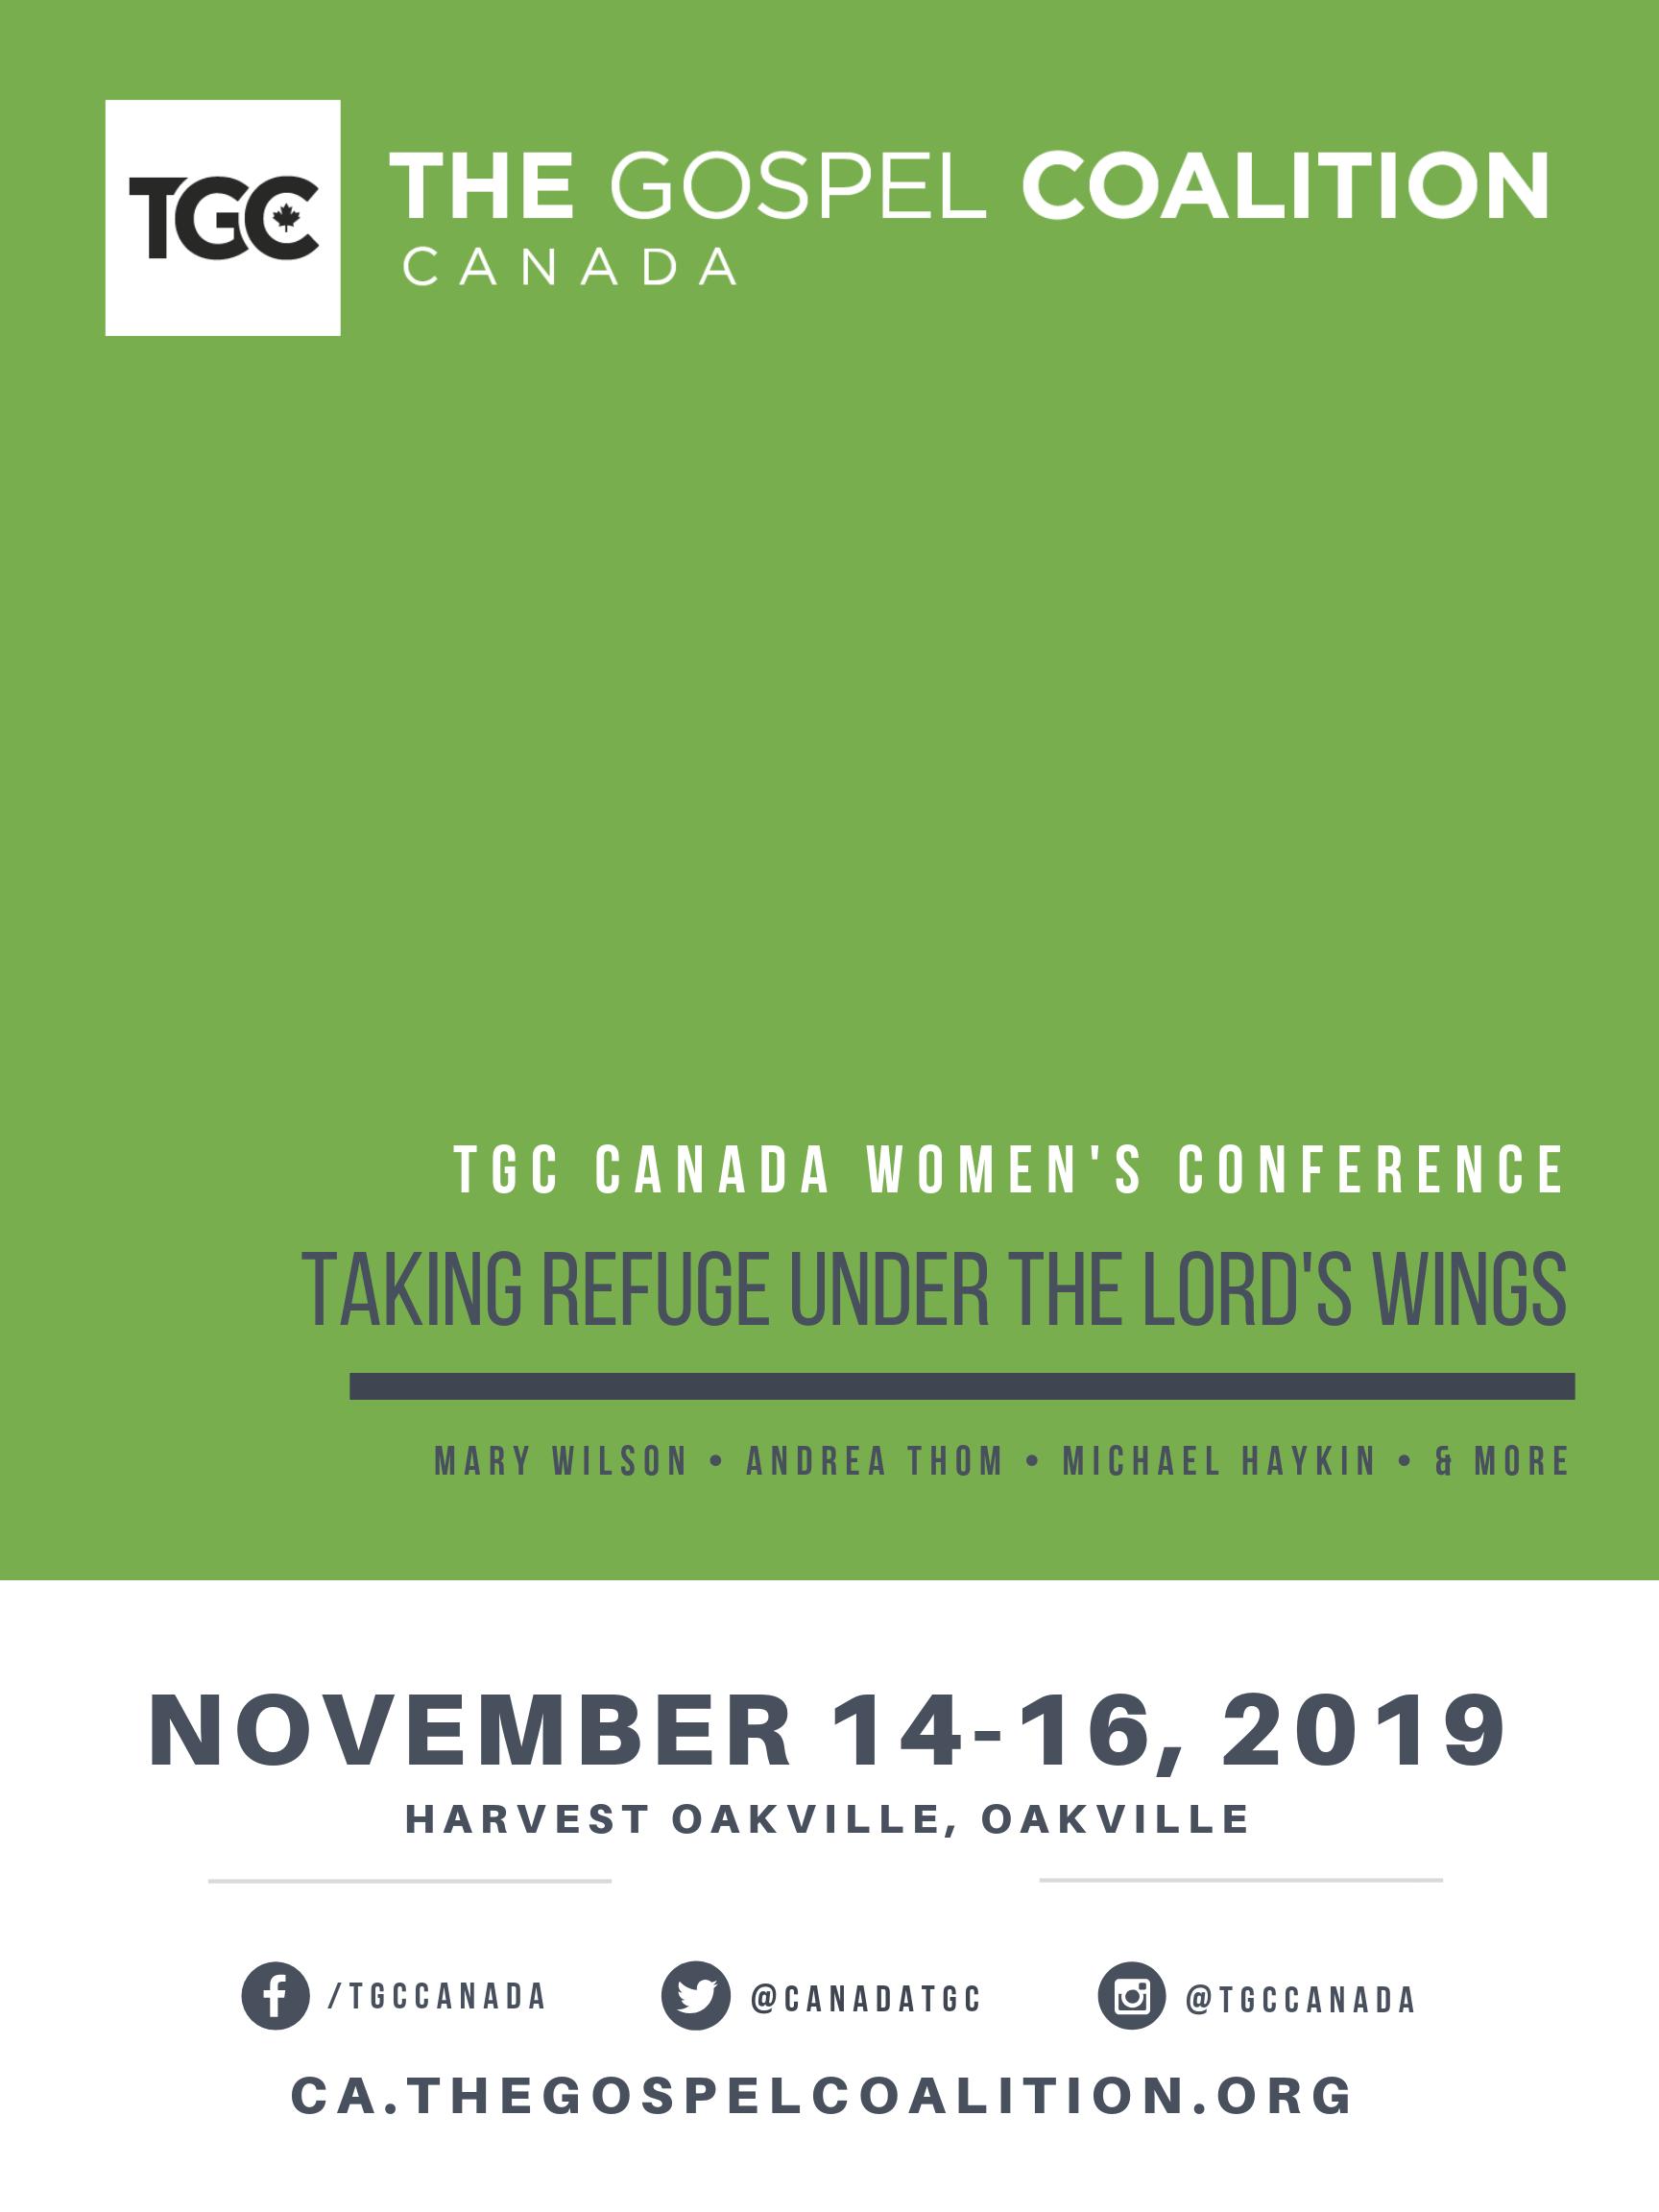 TGC Canada Women's Conference 2019 - The Gospel Coalition   Canada